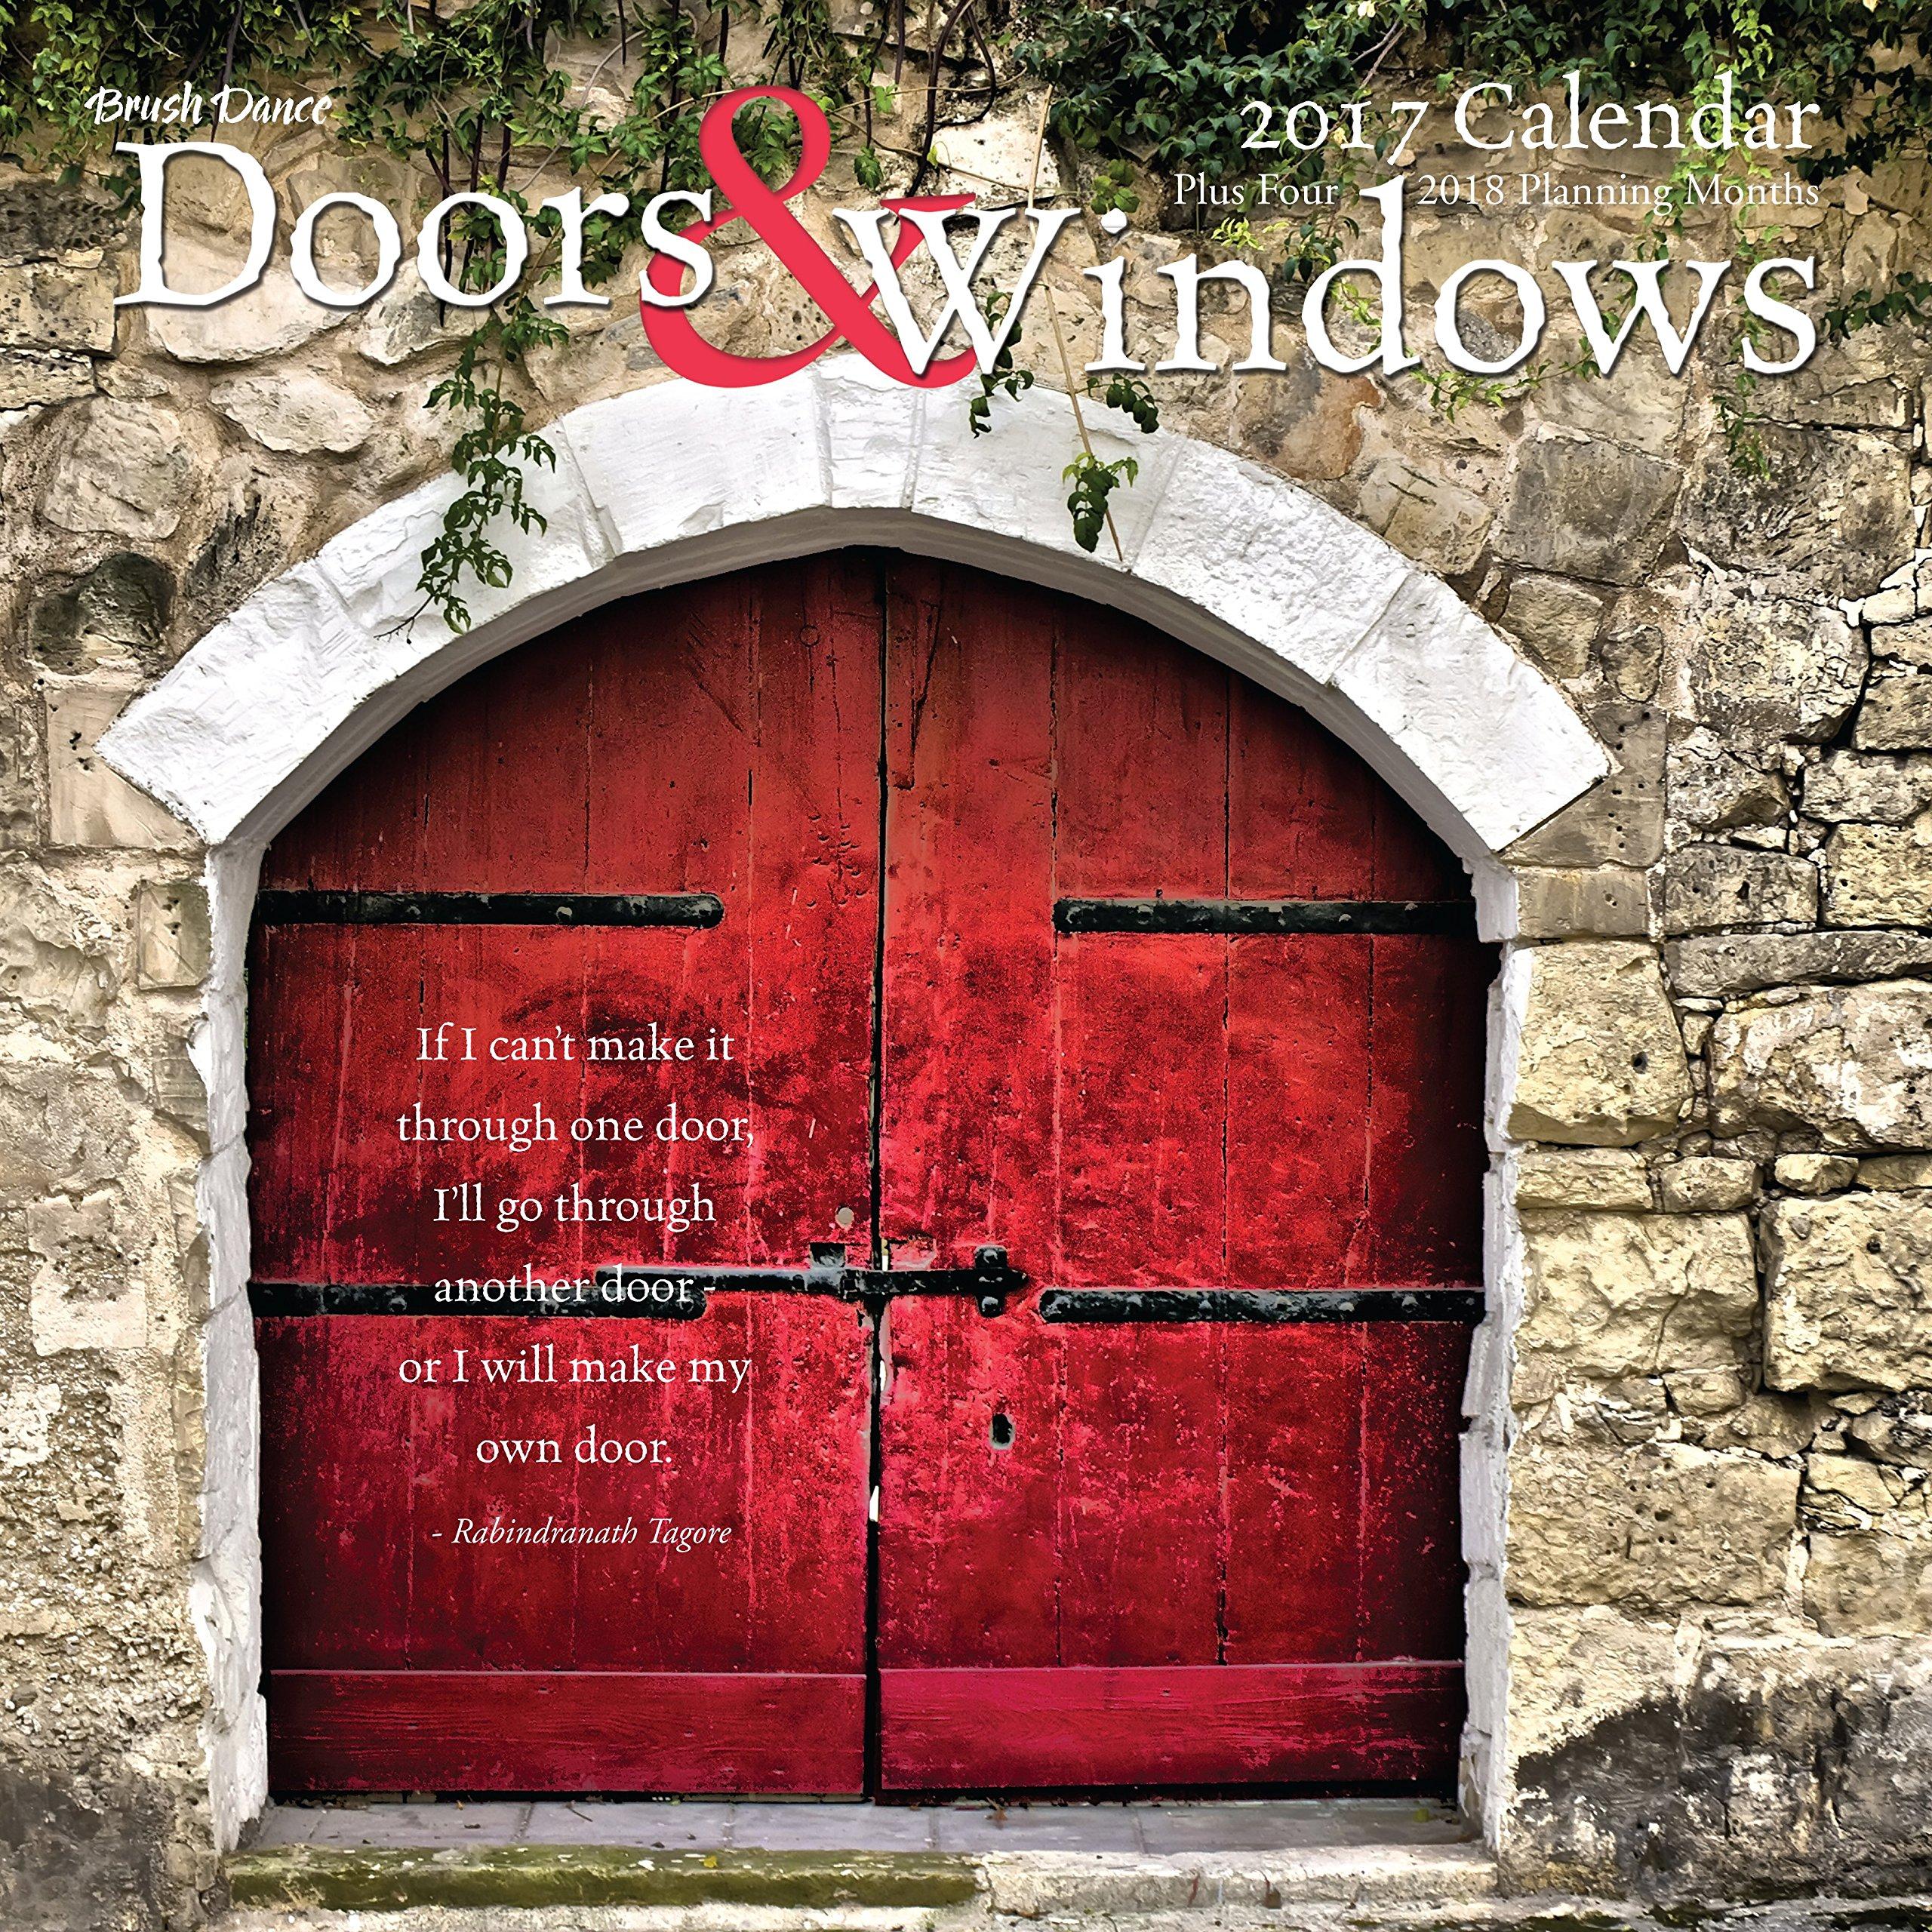 Doors Windows 2017 Wall Calendar Brush Dance 9781610464178